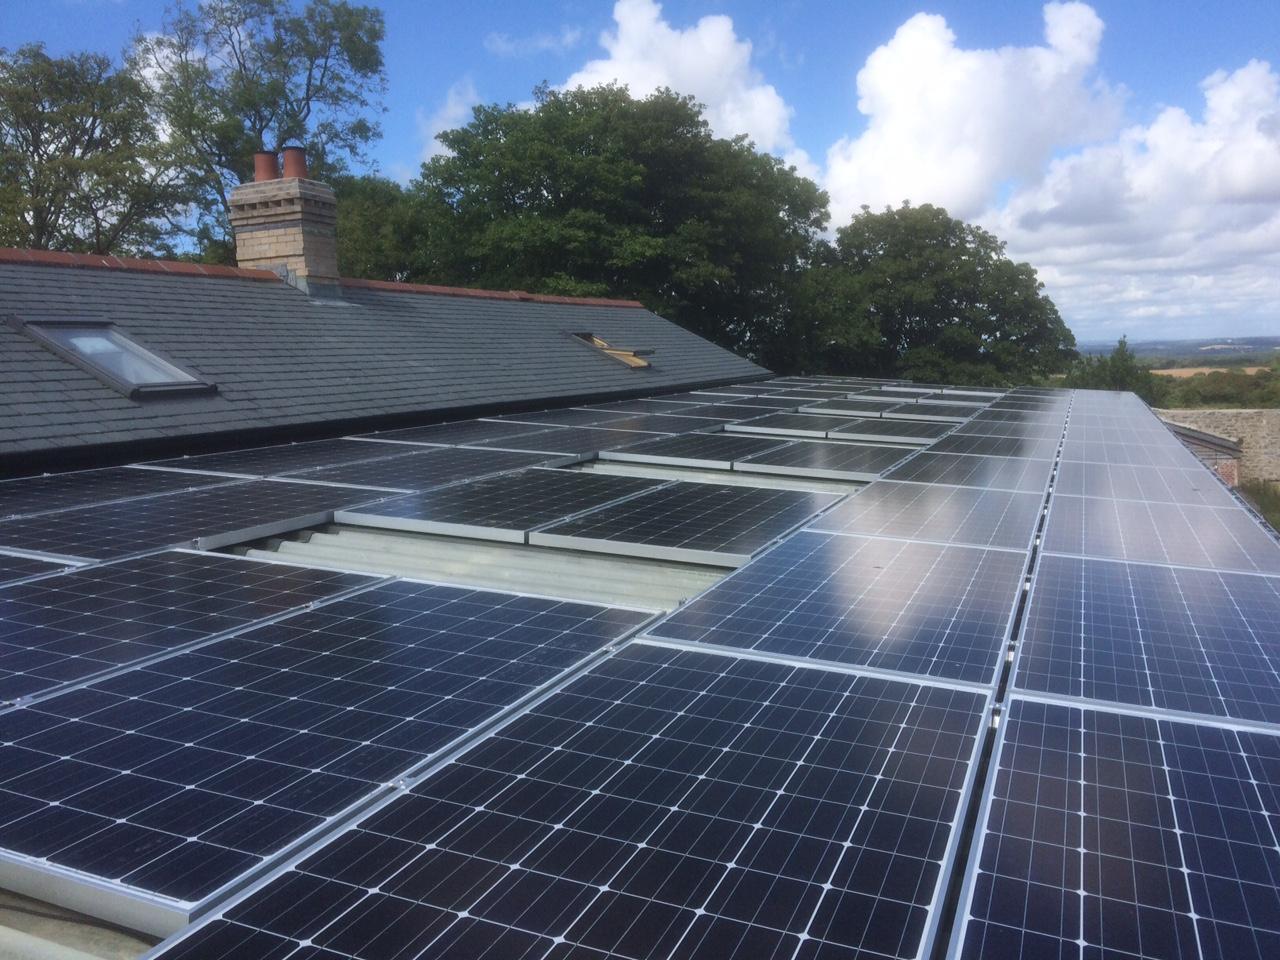 A solar PV system installed by GreenGenUK in Penryn